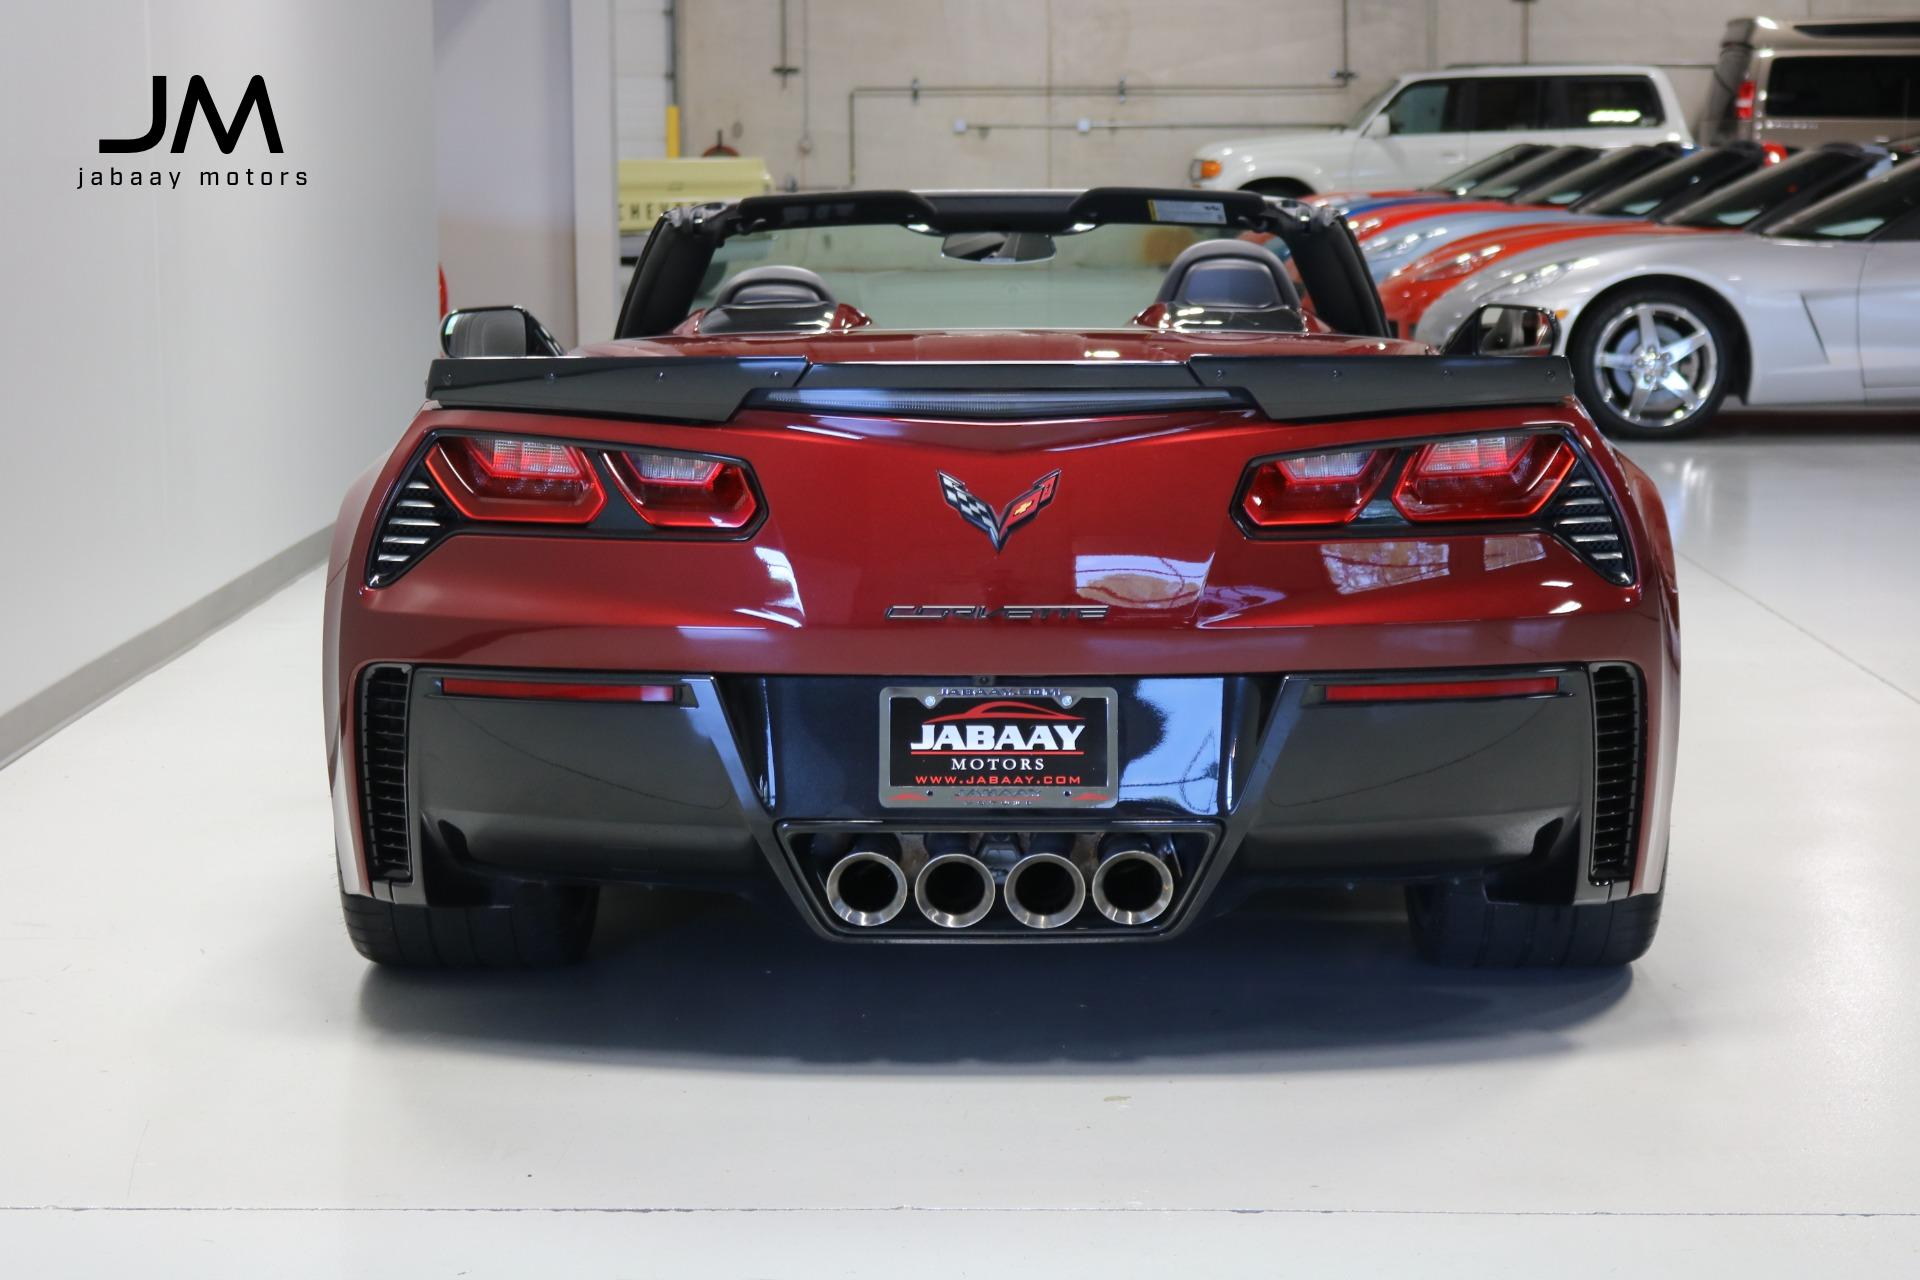 Used 2018 Chevrolet Corvette Grand Sport 2dr Convertible W 2lt For Sale Sold Jabaay Motors Inc Stock Jm7224